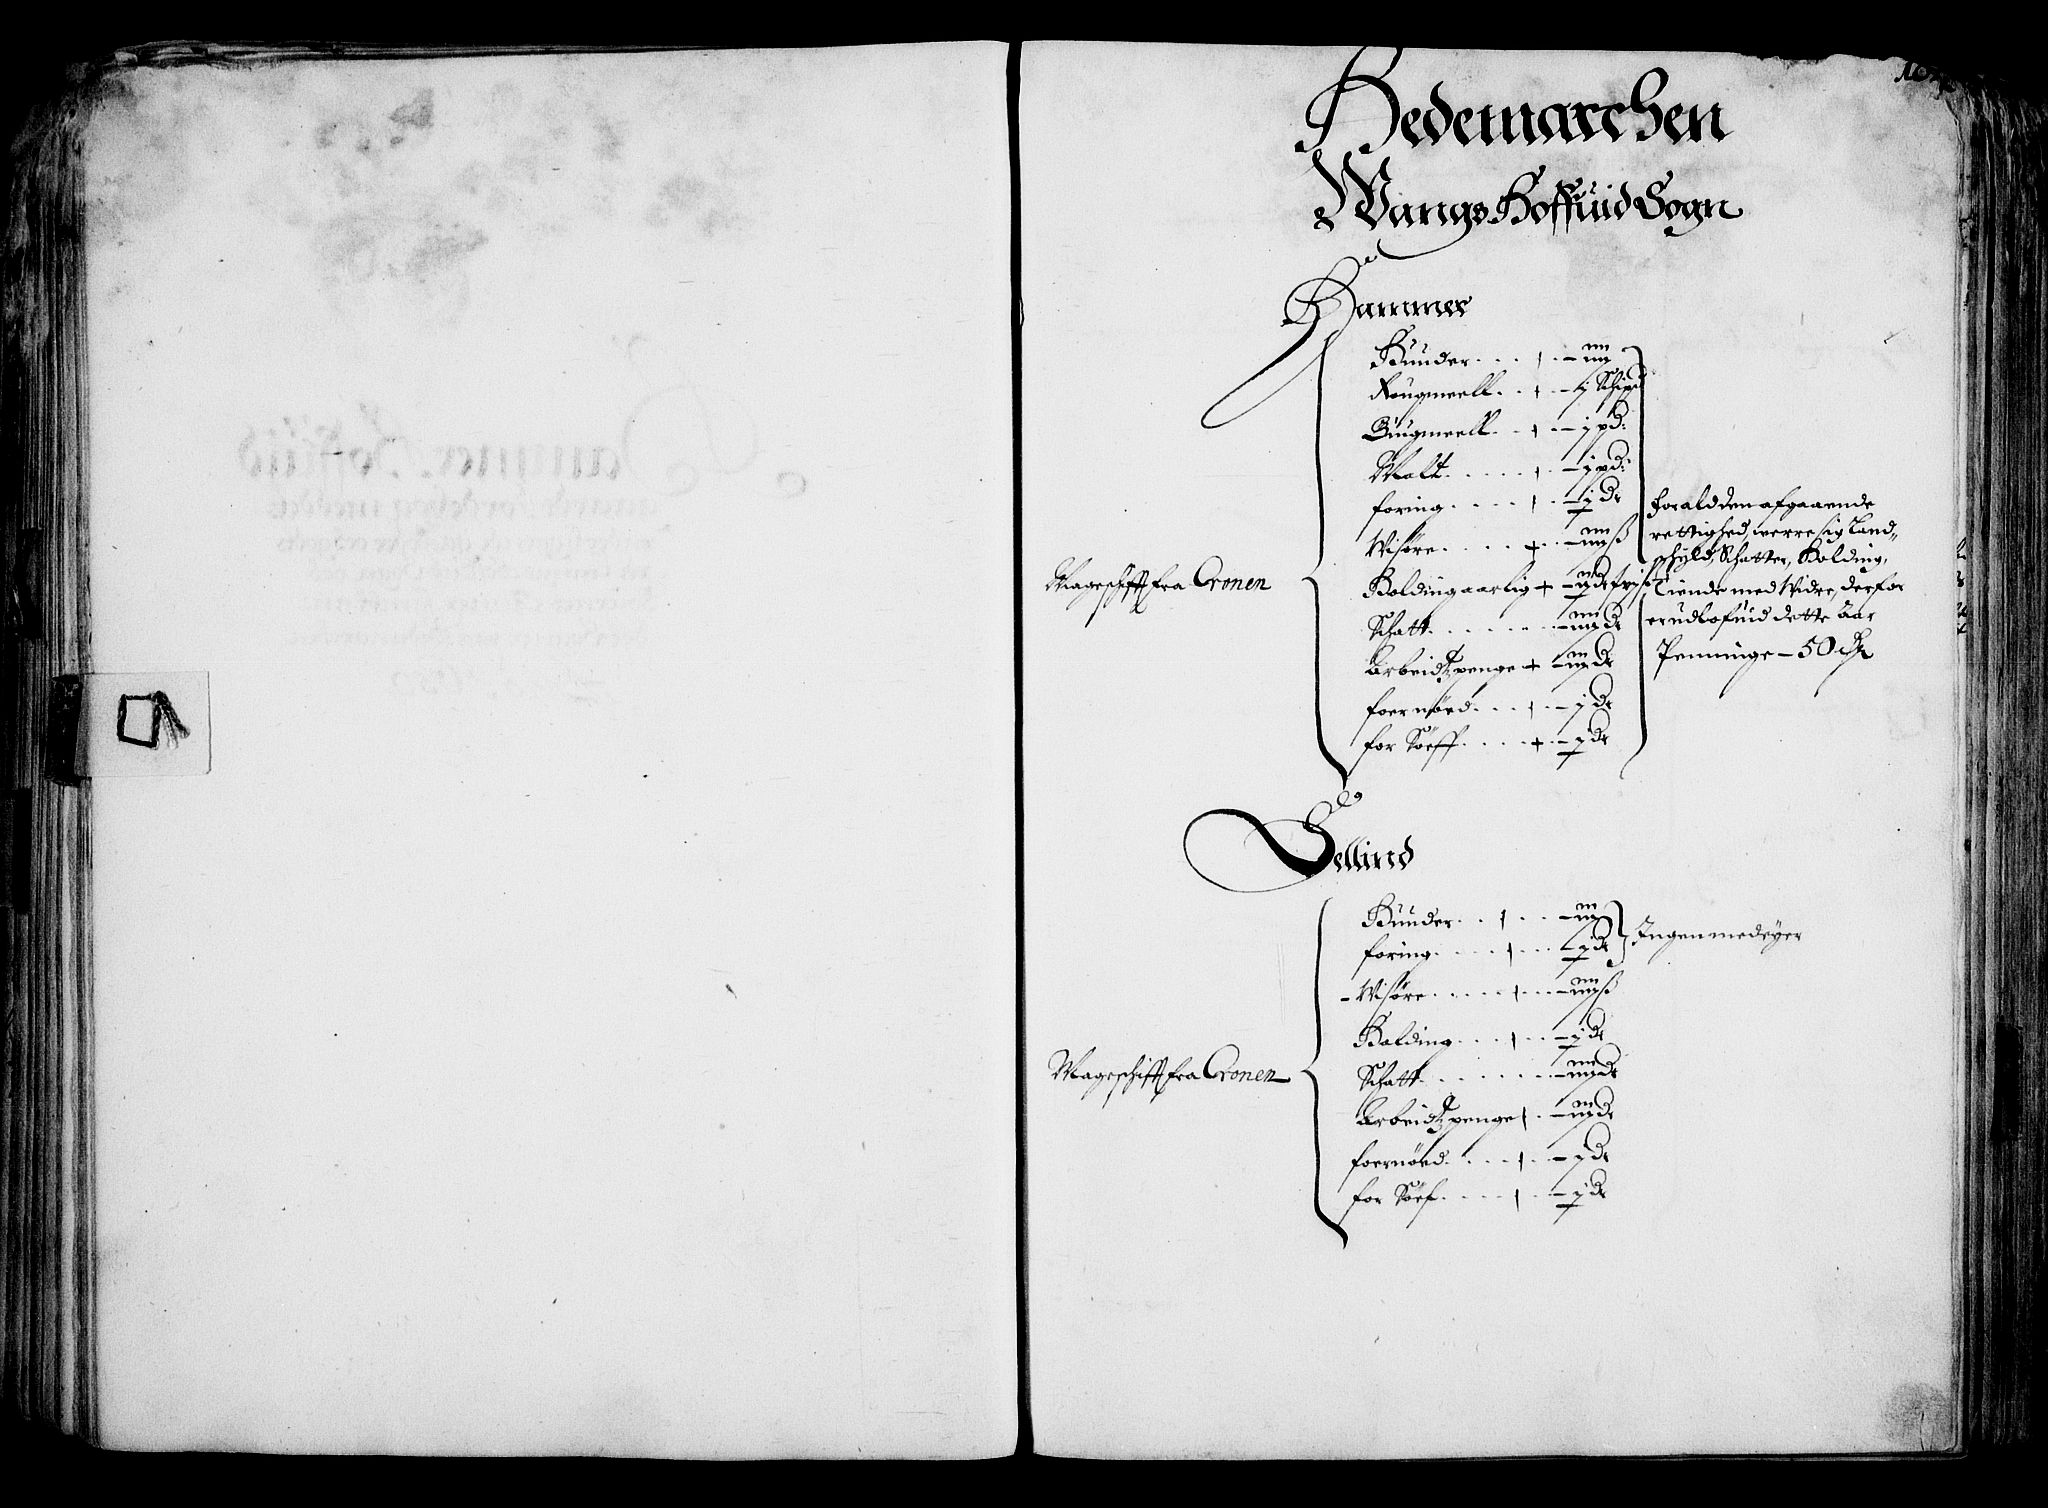 RA, Rentekammeret inntil 1814, Realistisk ordnet avdeling, On/L0001: Statens gods, 1651, s. 96